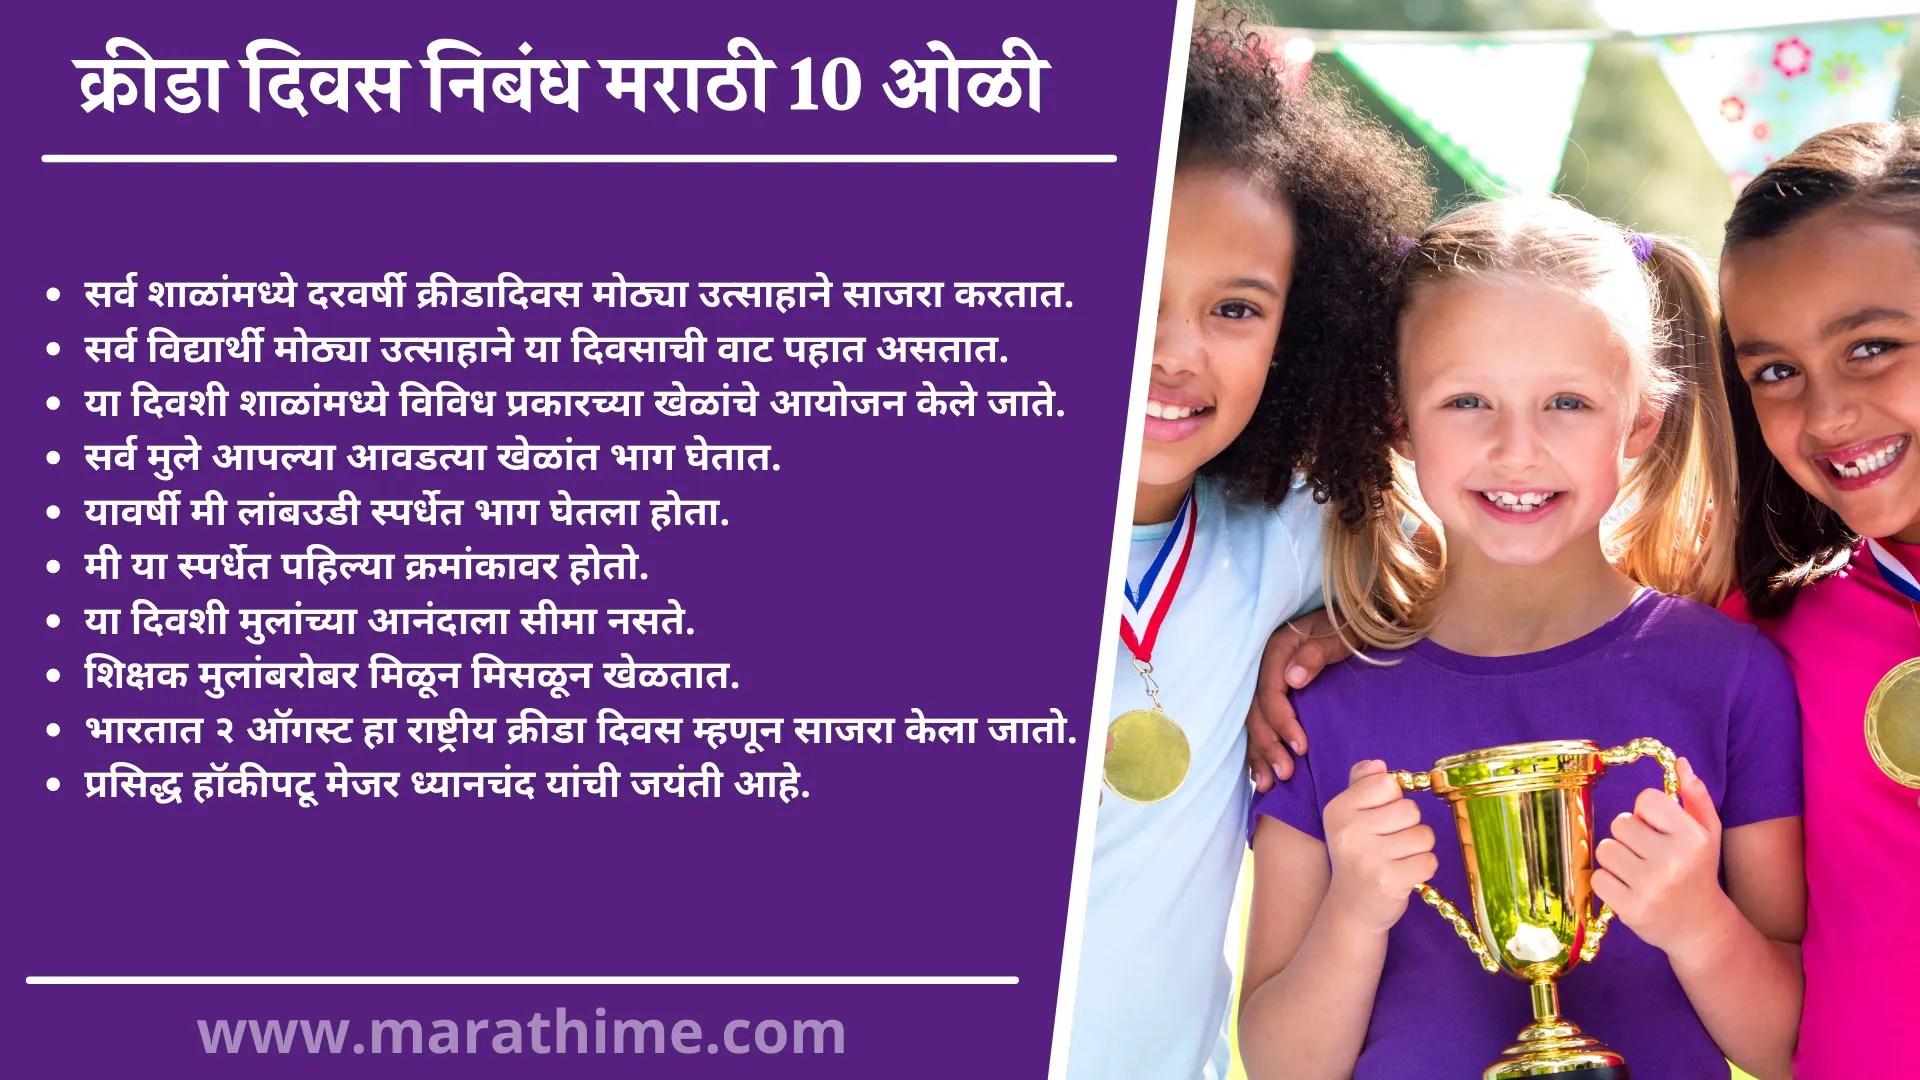 राष्ट्रीय-क्रीडा-दिवस-निबंध-मराठी-10-ओळी-10-Lines-on-Sports-Day-in-Marathi